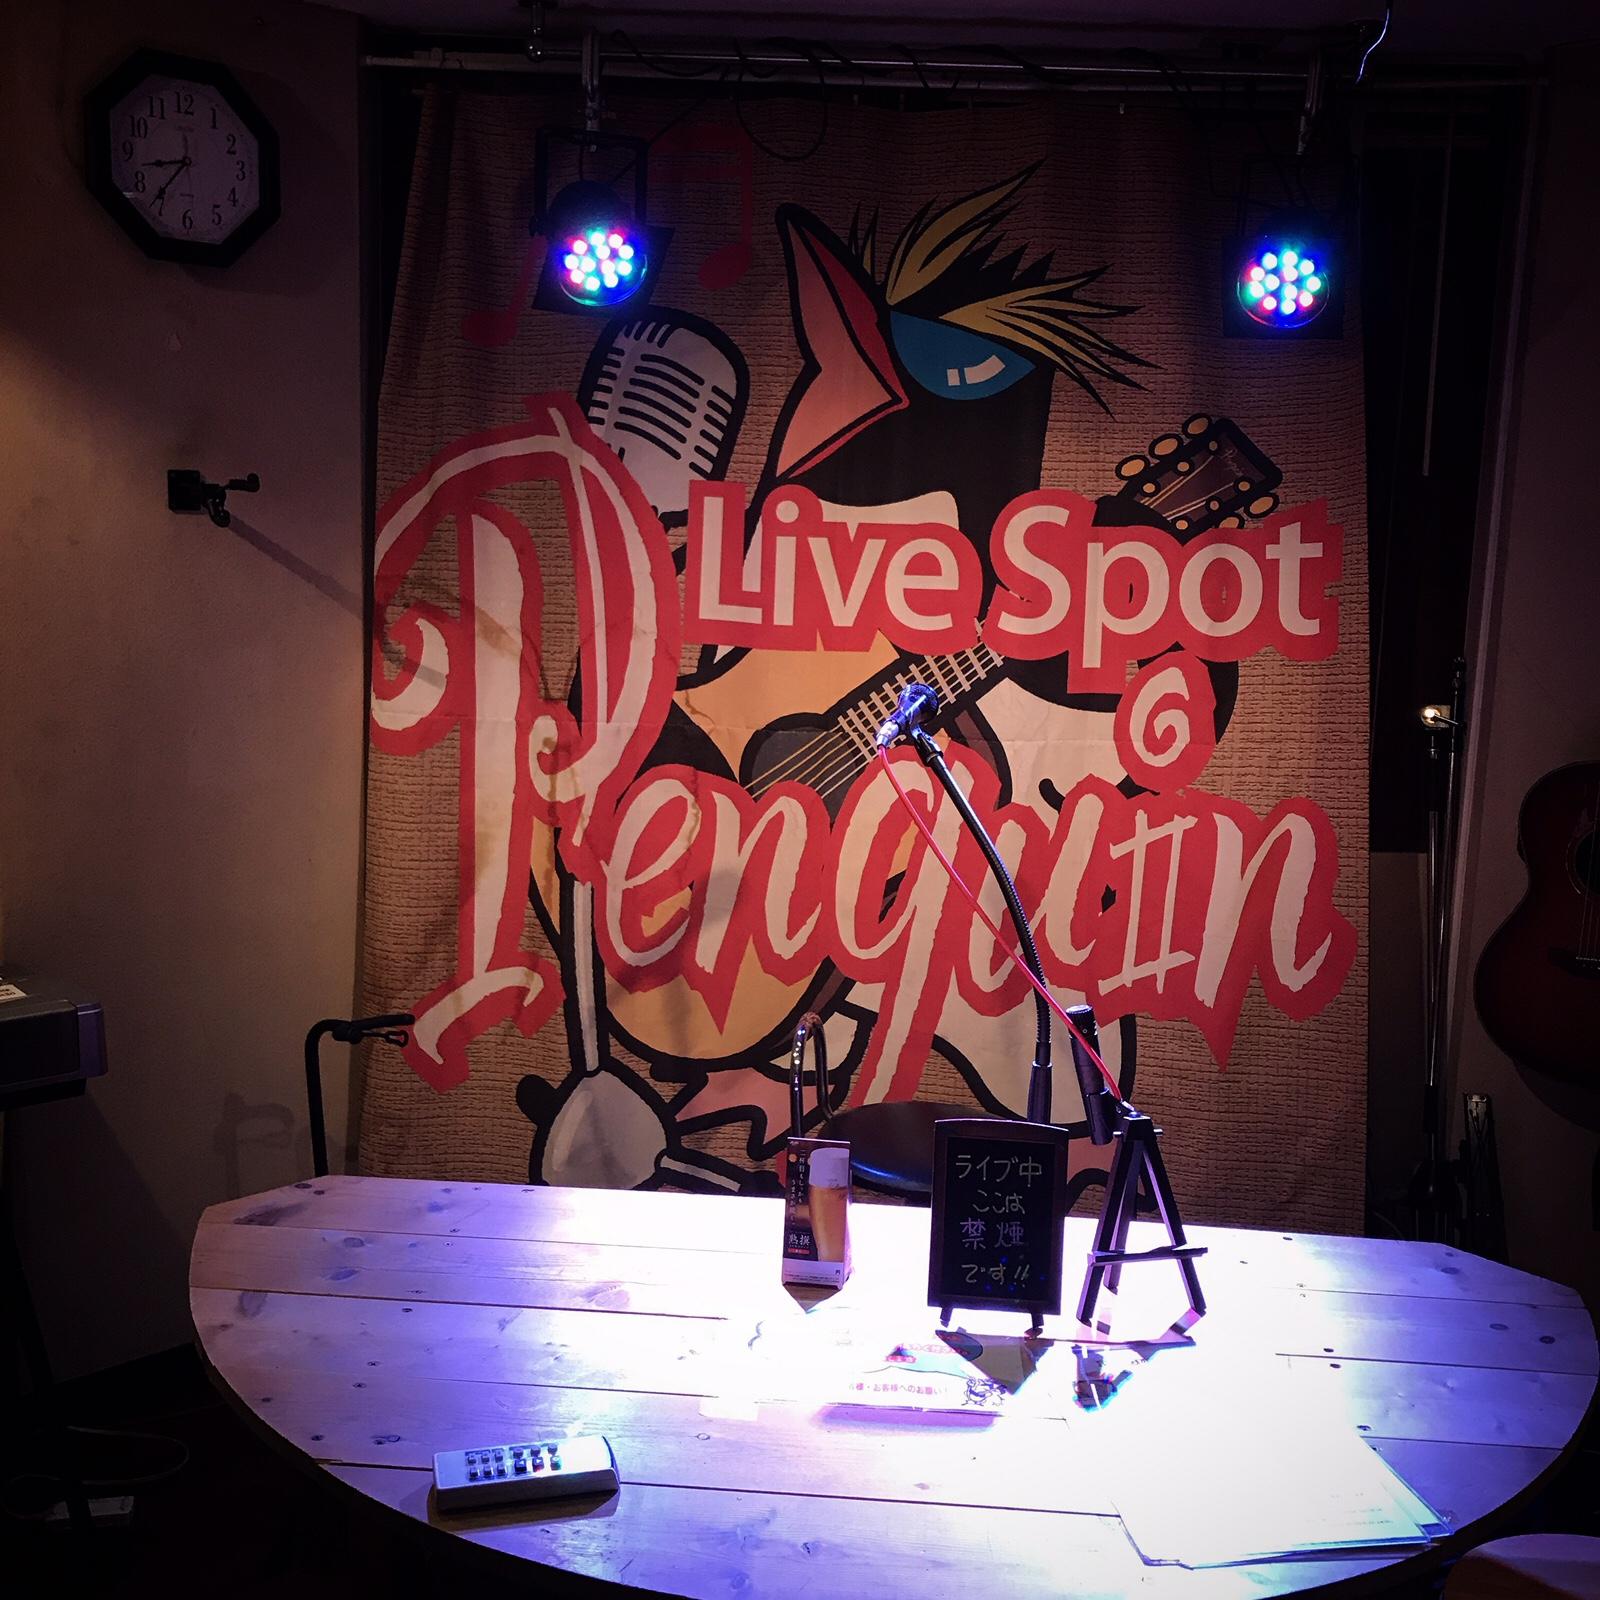 LiveSpot Penguin